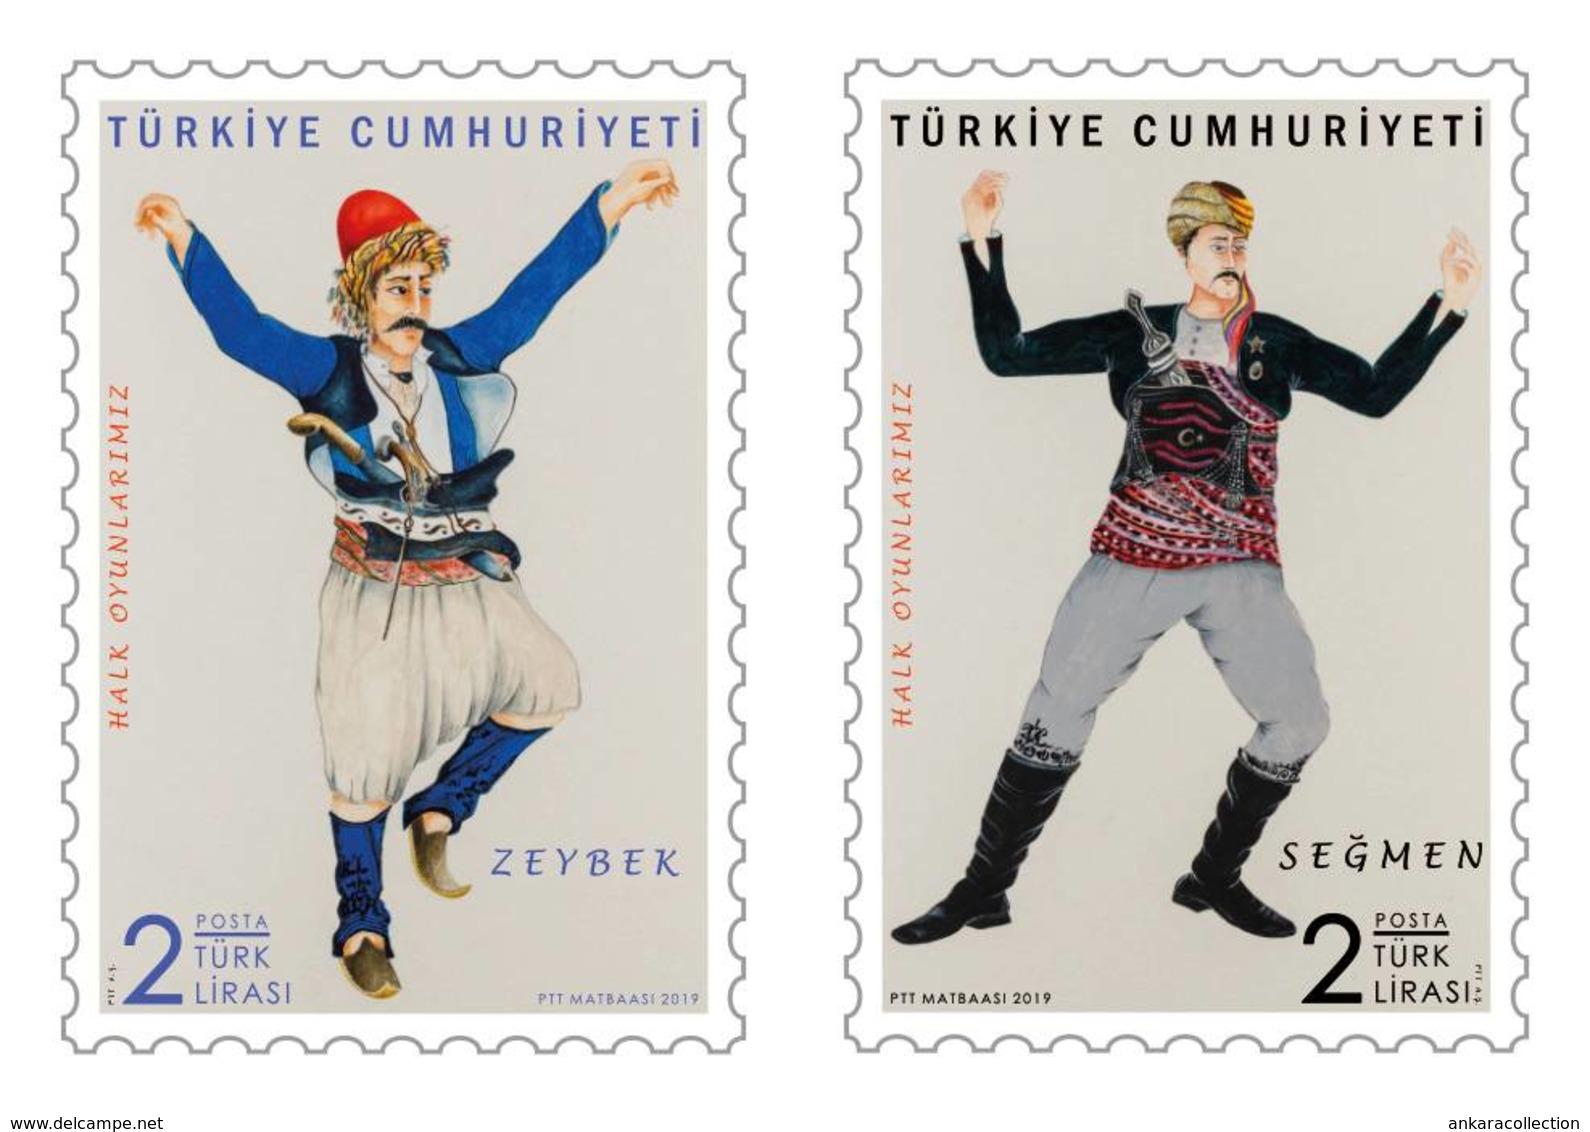 AC - TURKEY STAMP - TURKISH FOLK DANCES MNH 05 FEBRUARY 2019 - 1921-... República